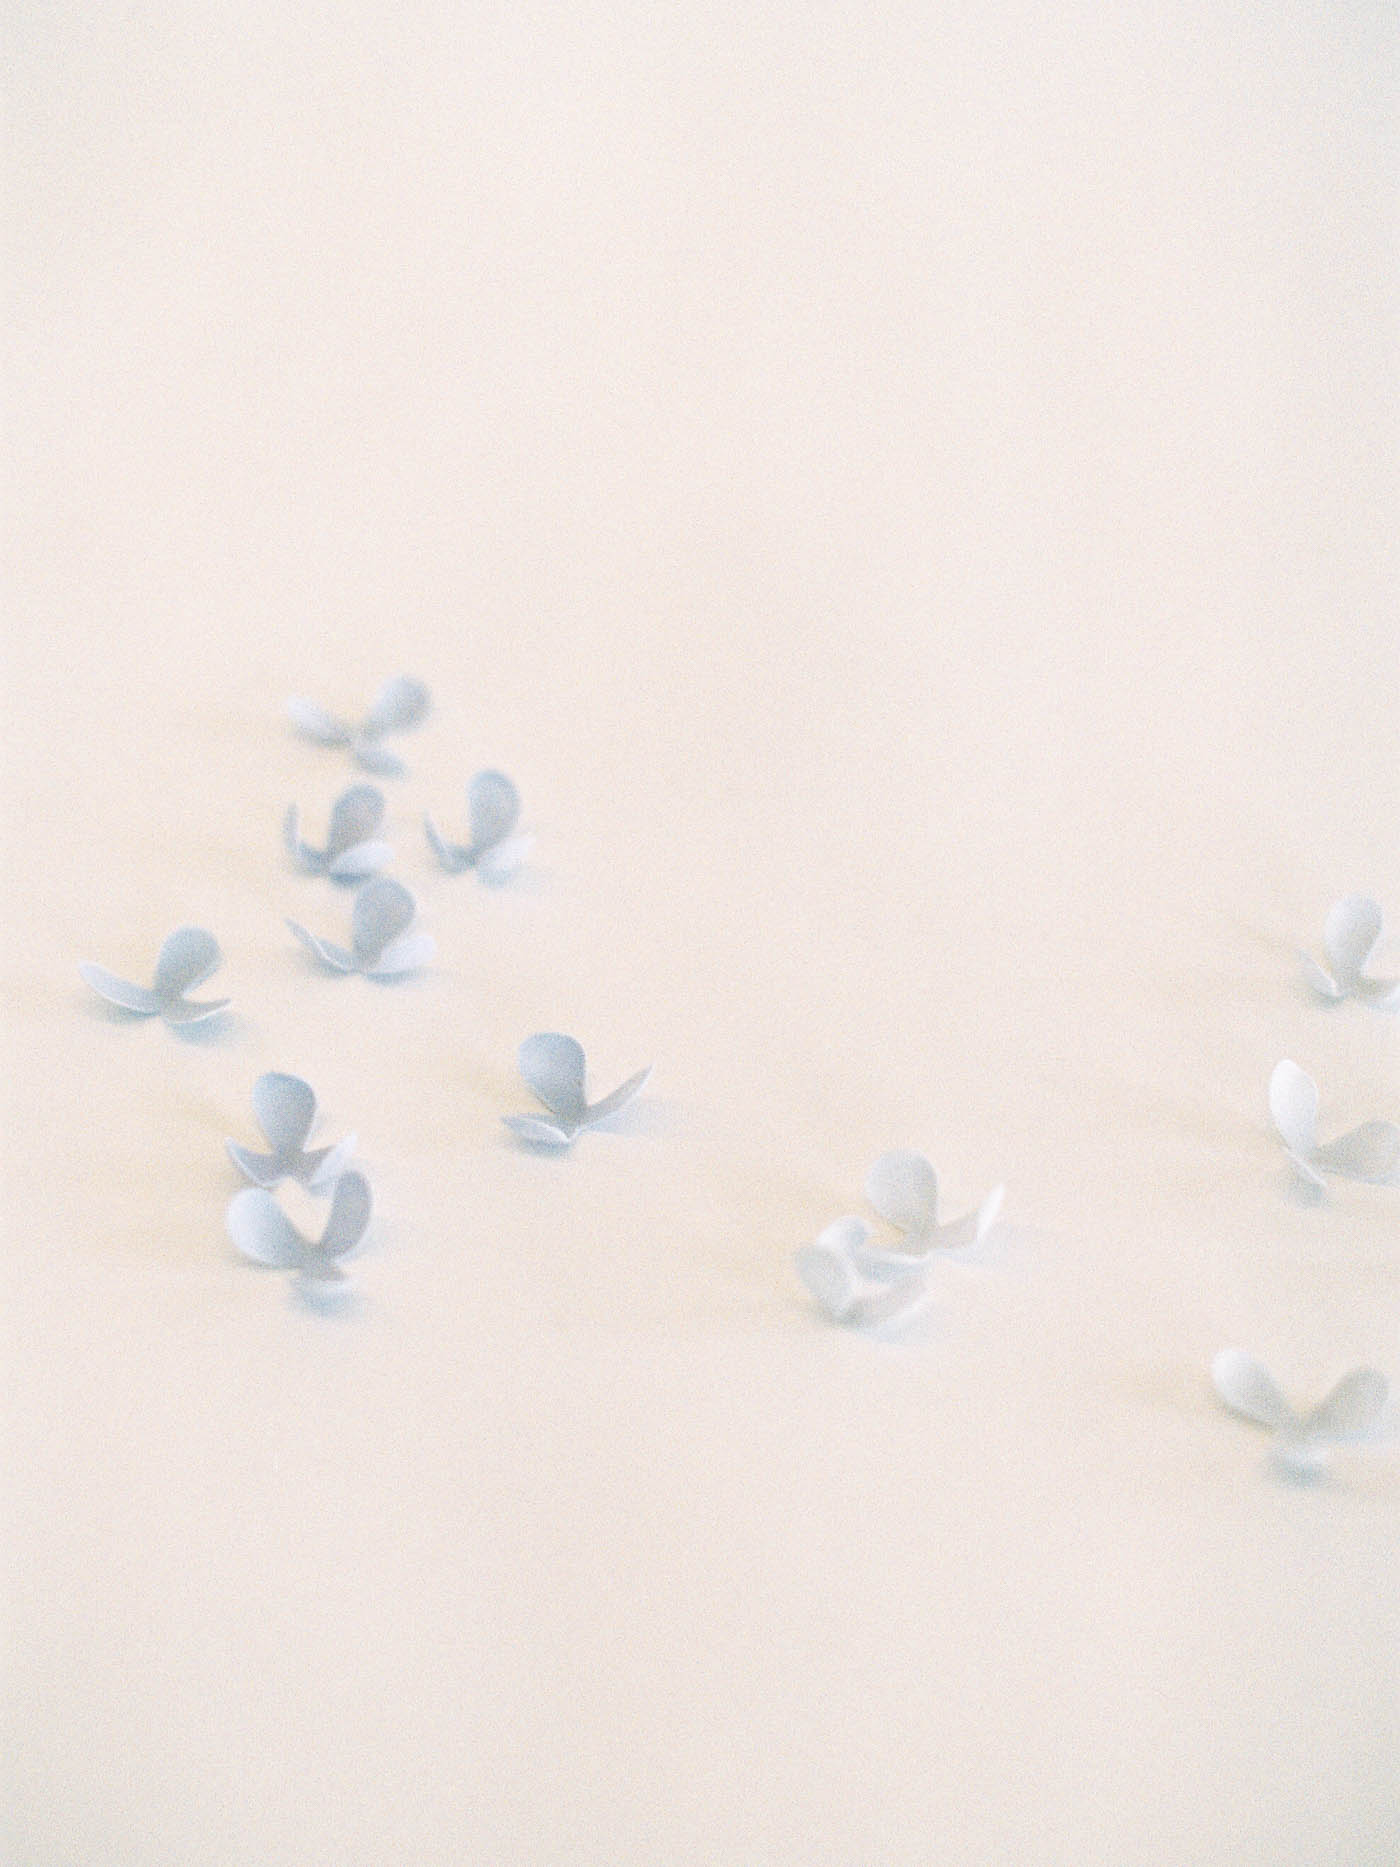 Delicate-Wedding-Cakes-17-Jen_Huang-002344-R1-035.jpg